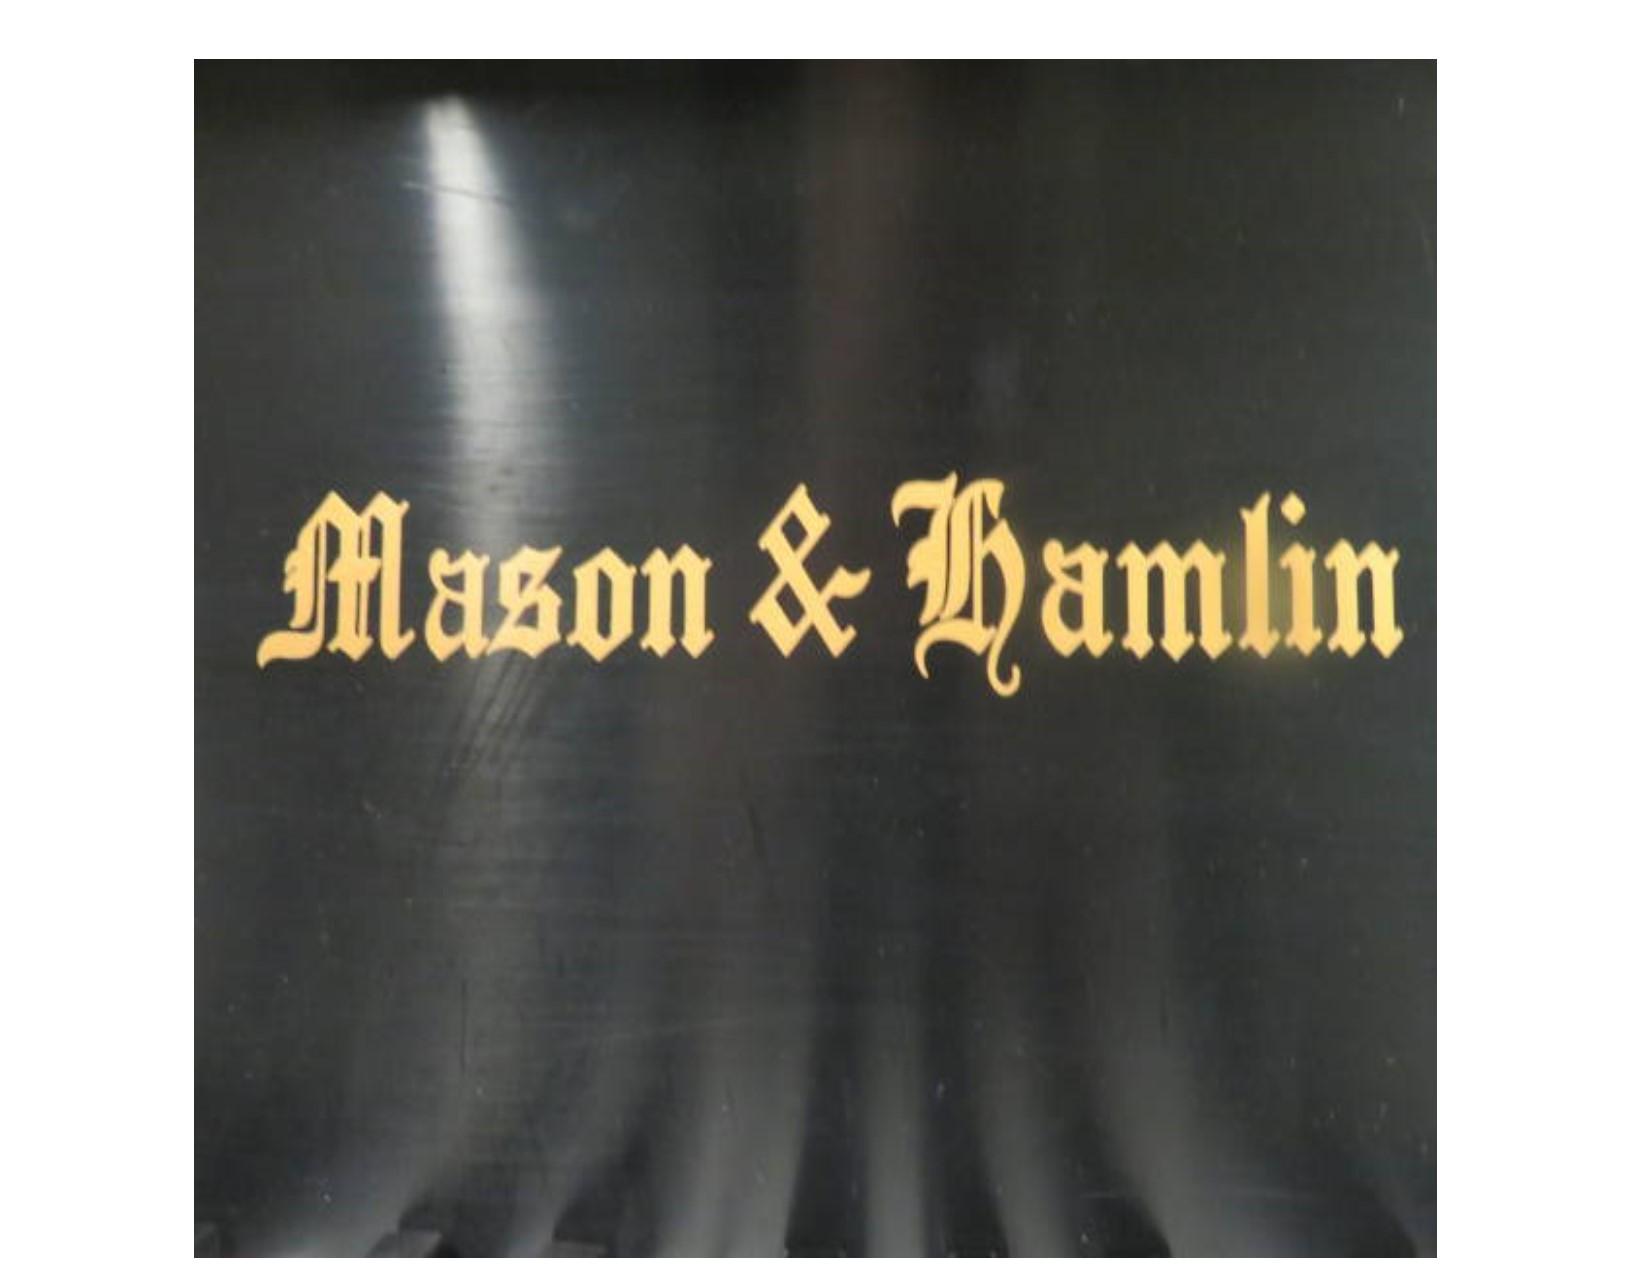 "12498-<br><font color=black><b>MASON & HAMLIN VINTAGE</b></font> 7'0″ Model BB Concert Grand Professionally Rebuilt and Refinished Classic Satin Ebony <br><font color=blue><b>Click Picture for ""Live Video""</b></font>"